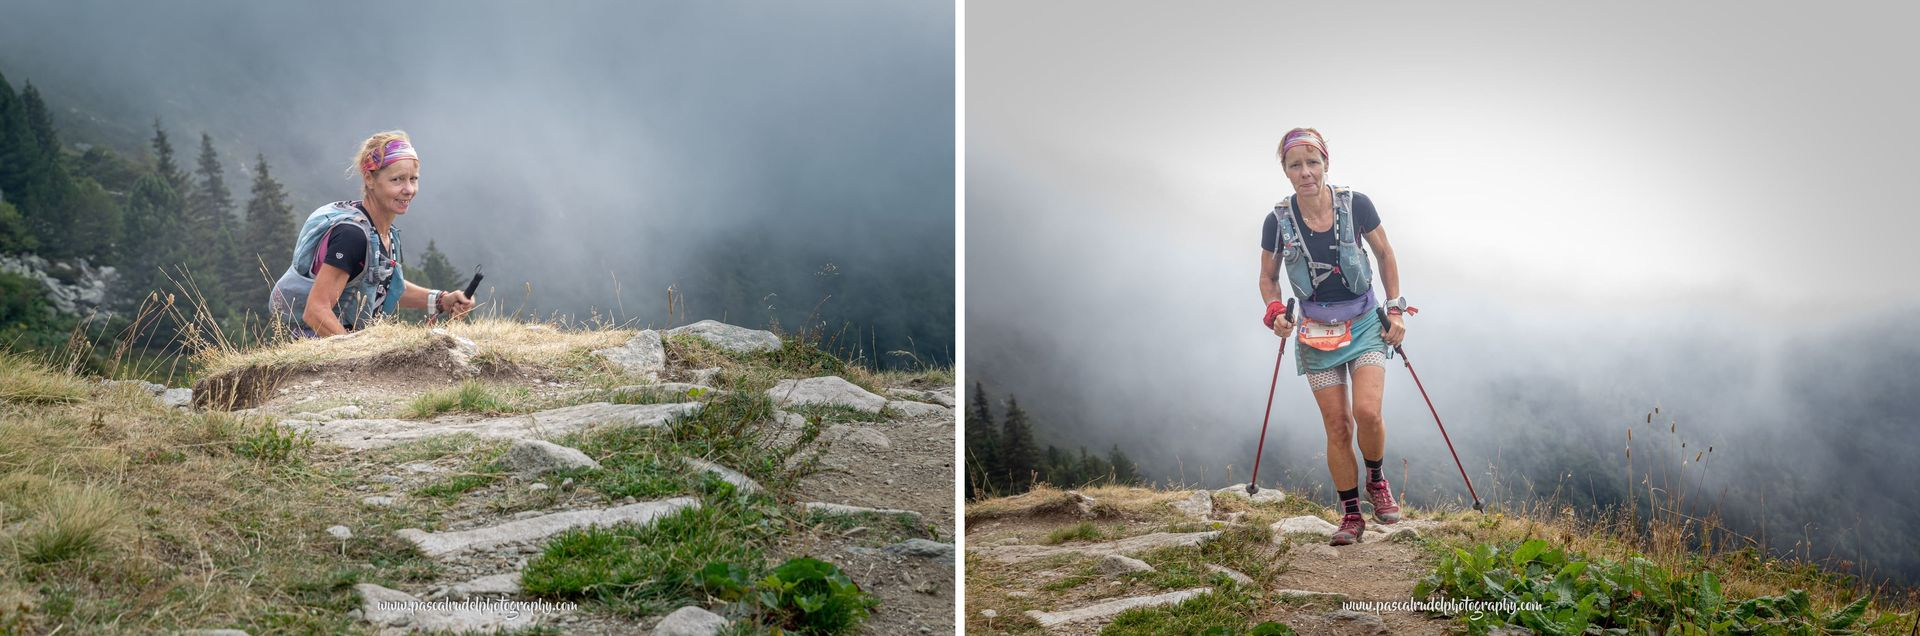 3 emergence-brouillard